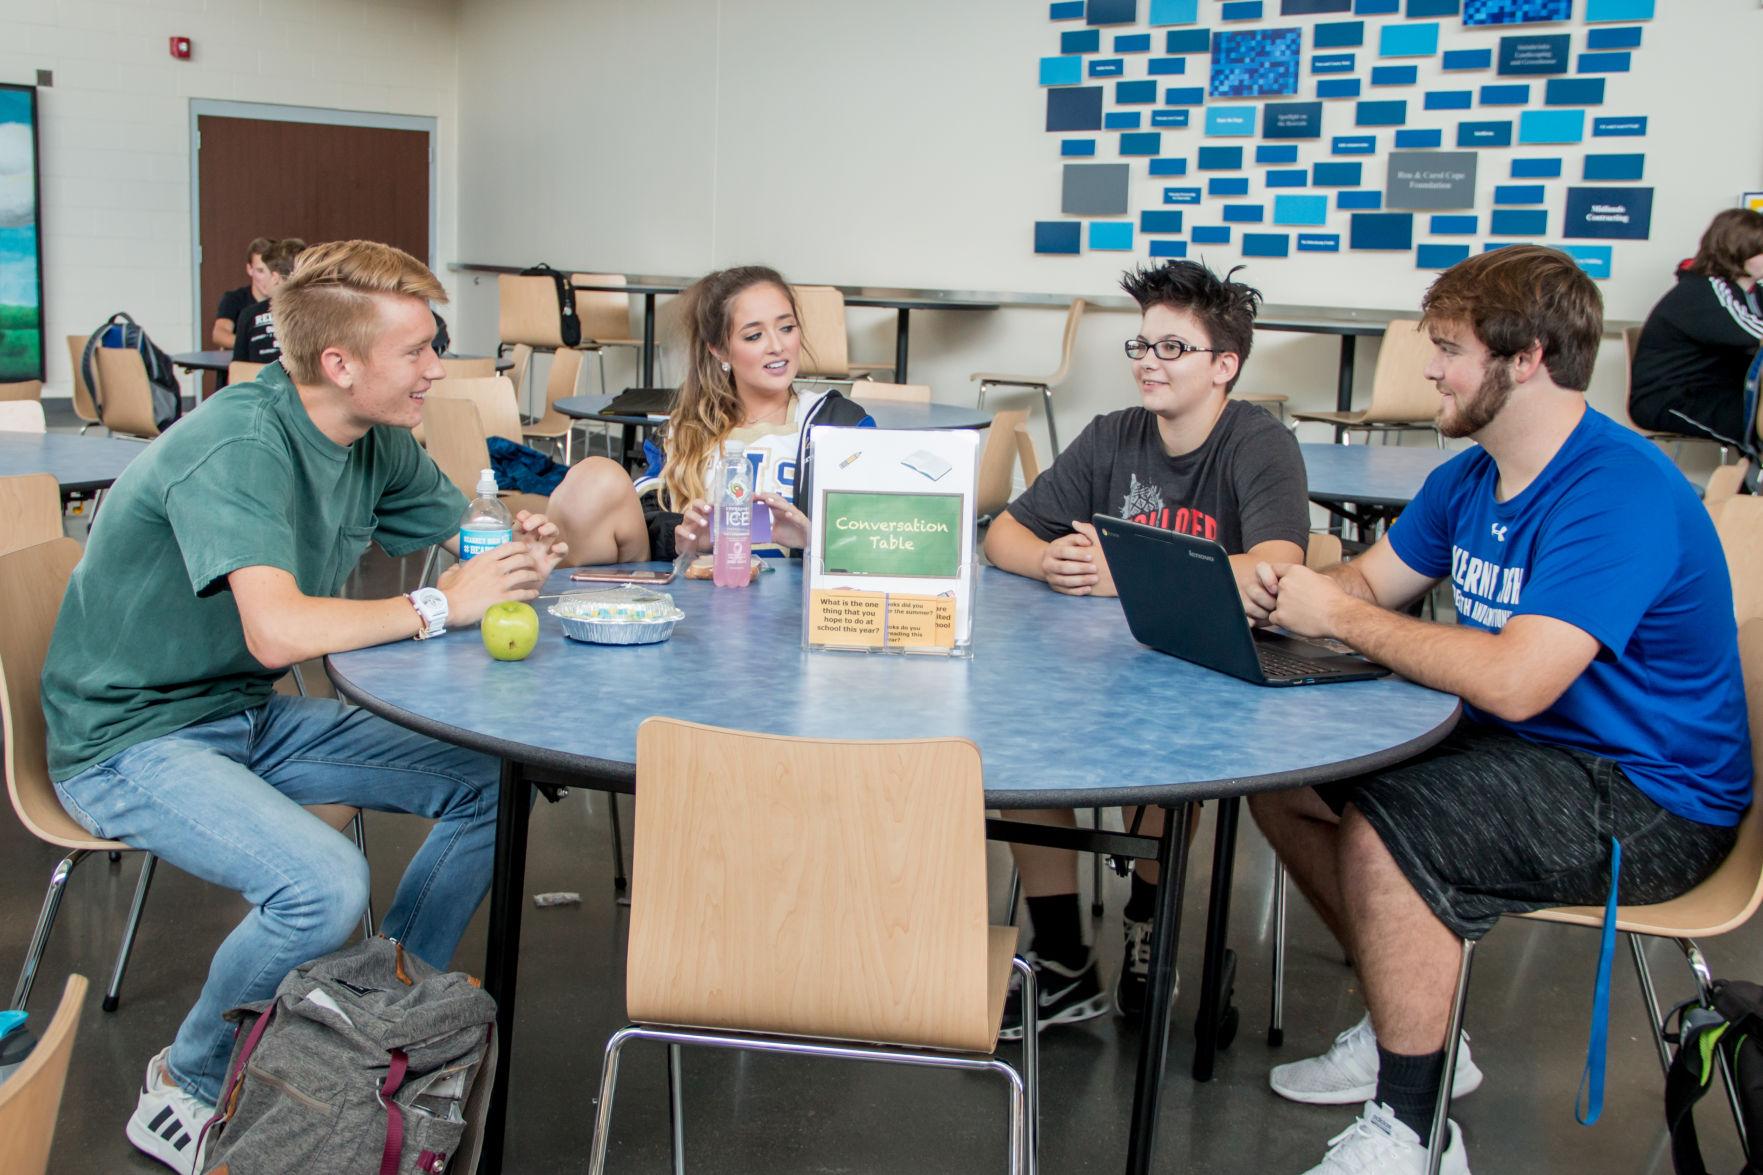 KHS Conversation Table Cafeteria